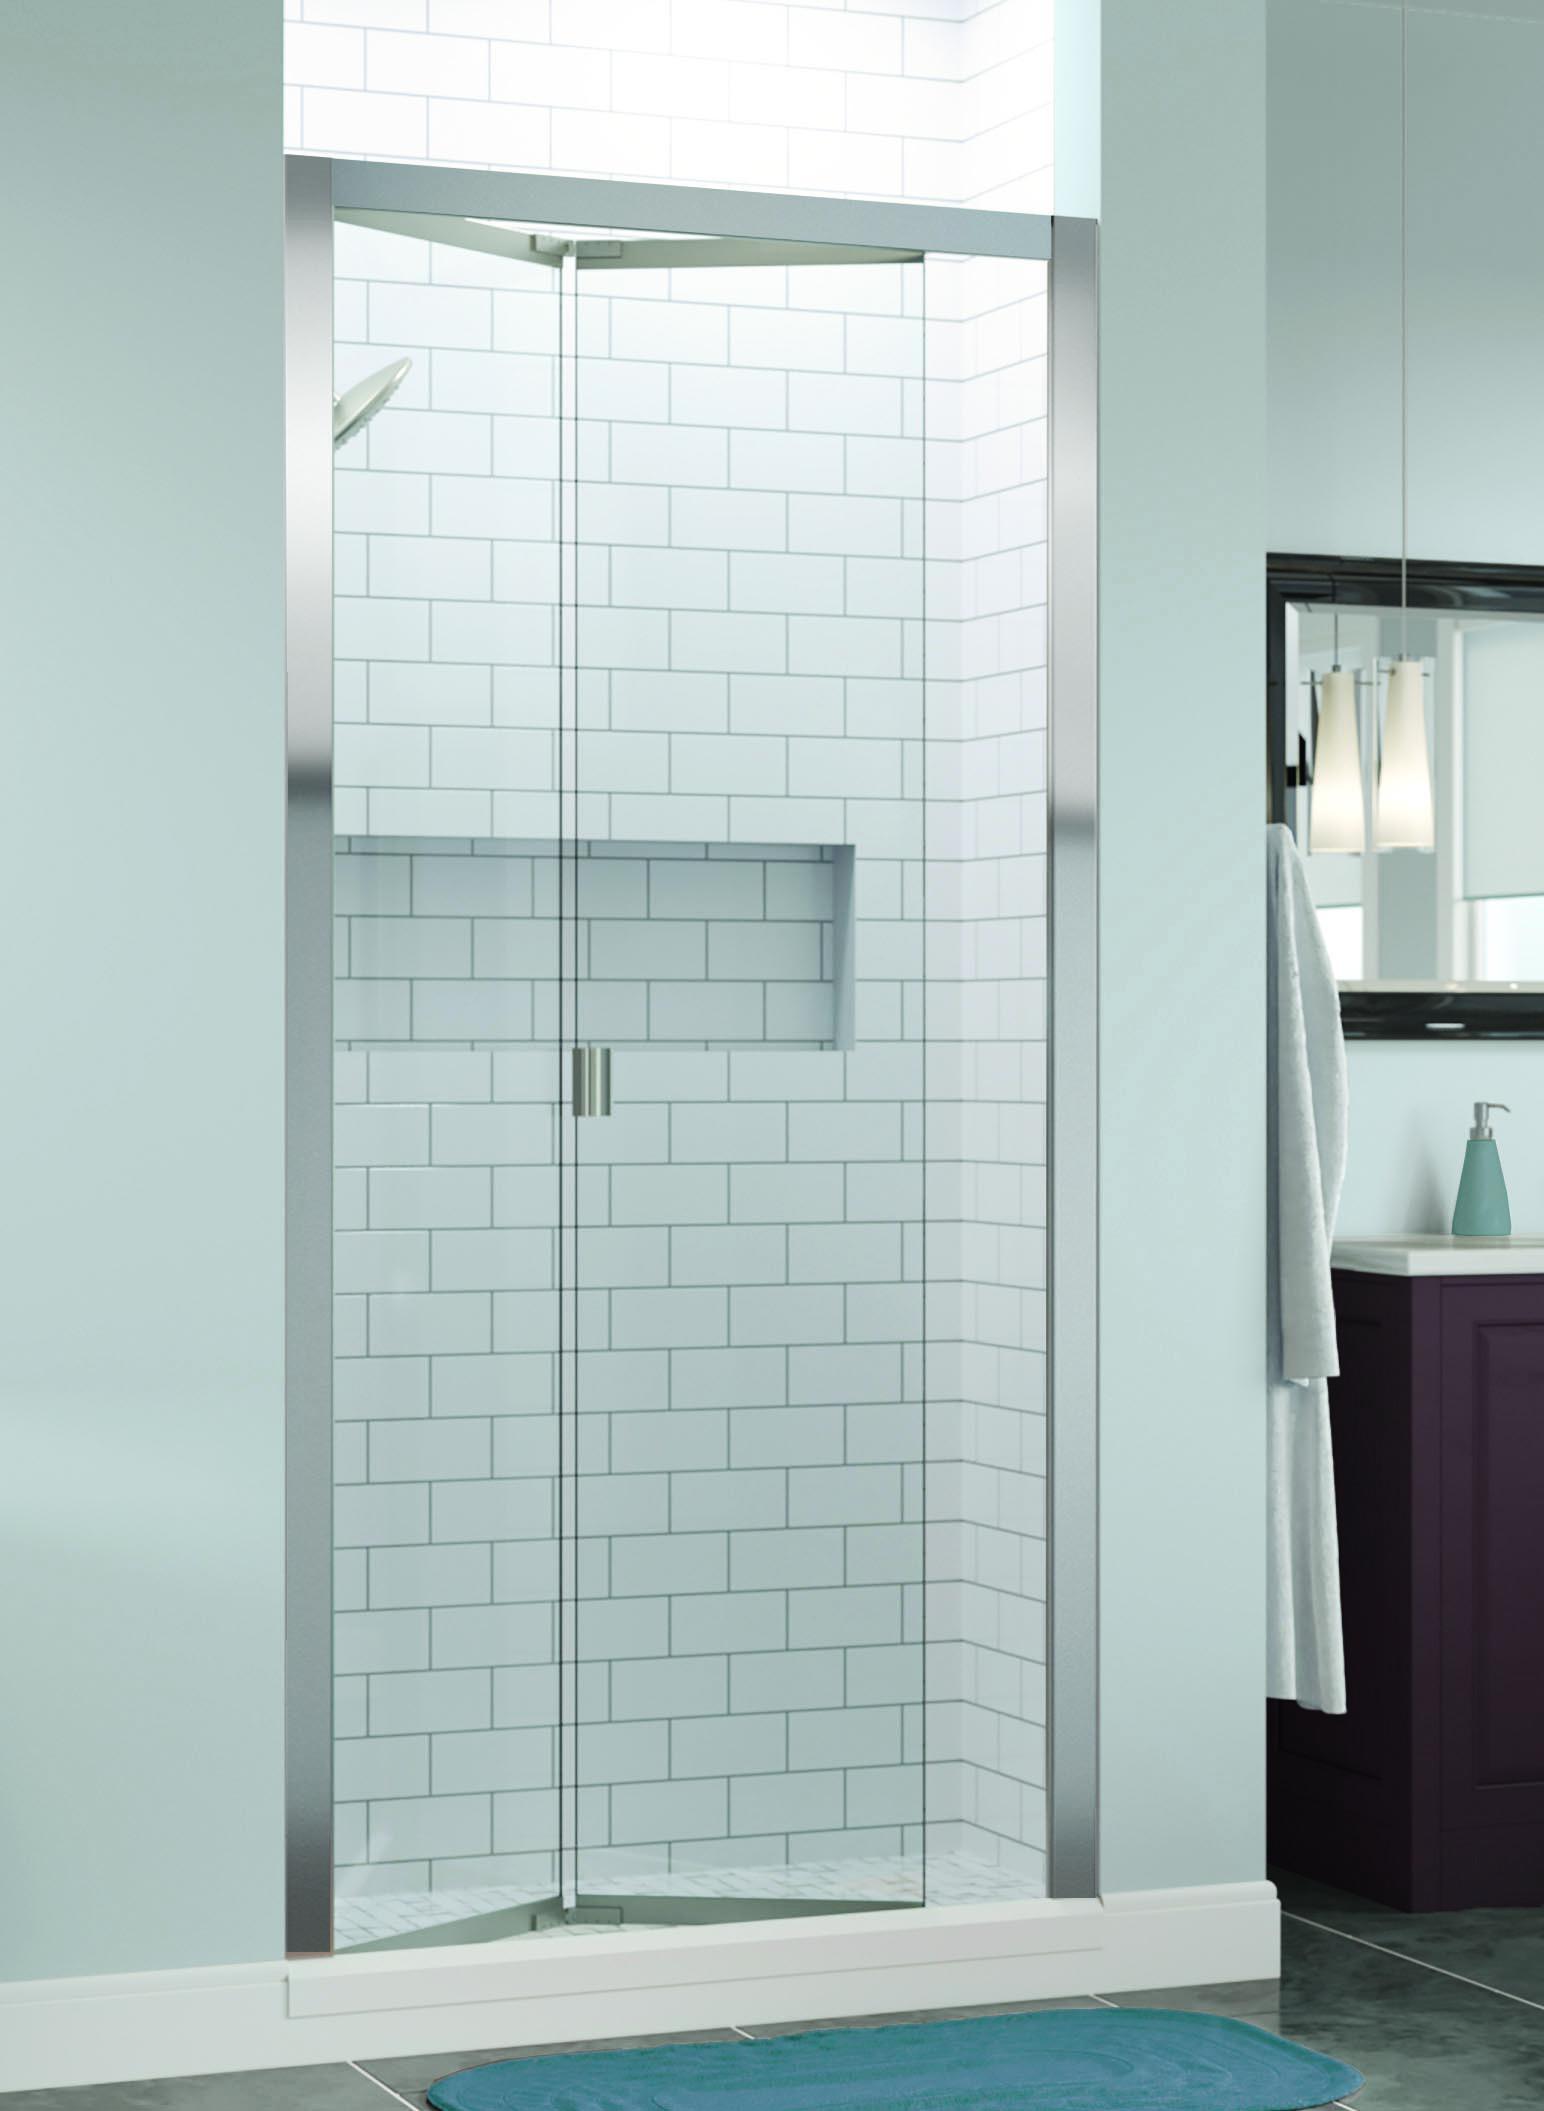 Basco Infh11a3172 Infinity 29 0625 31 Inch Opening Semi Frameless Bifold Shower Door